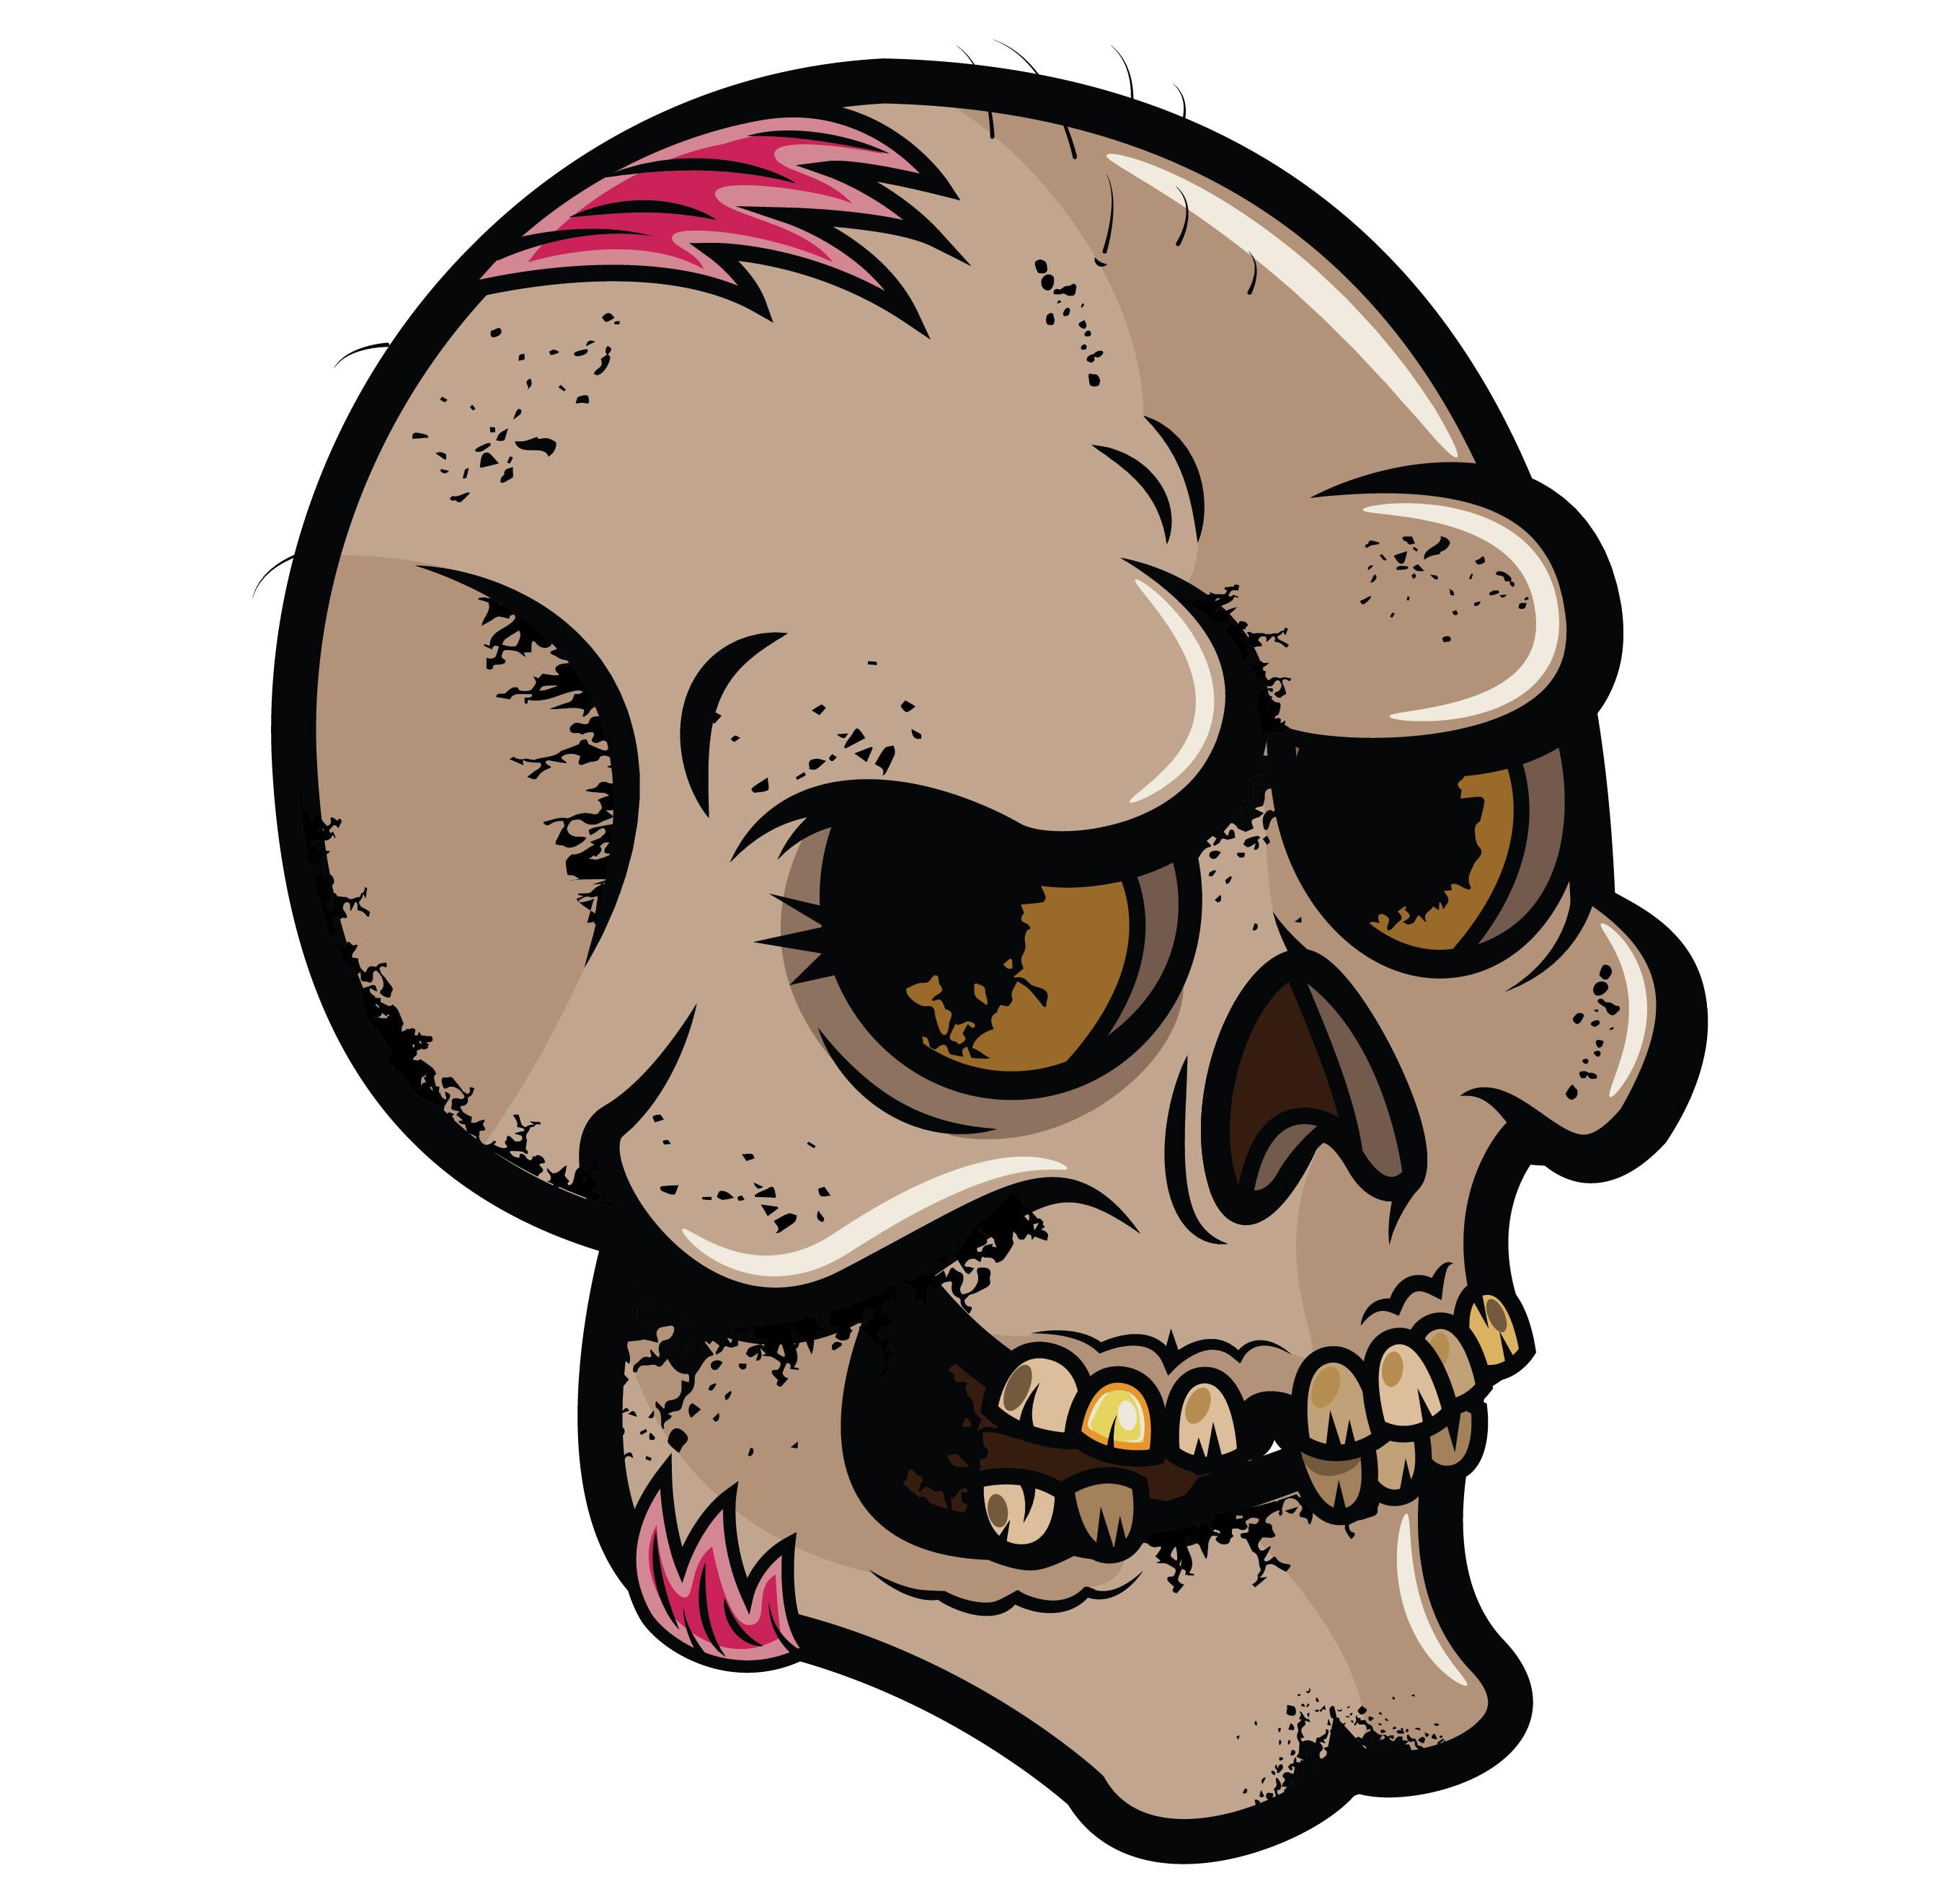 2719x2642 Halloween ~ Scary Font Halloween Mask Skull Sugar Painting Skulls